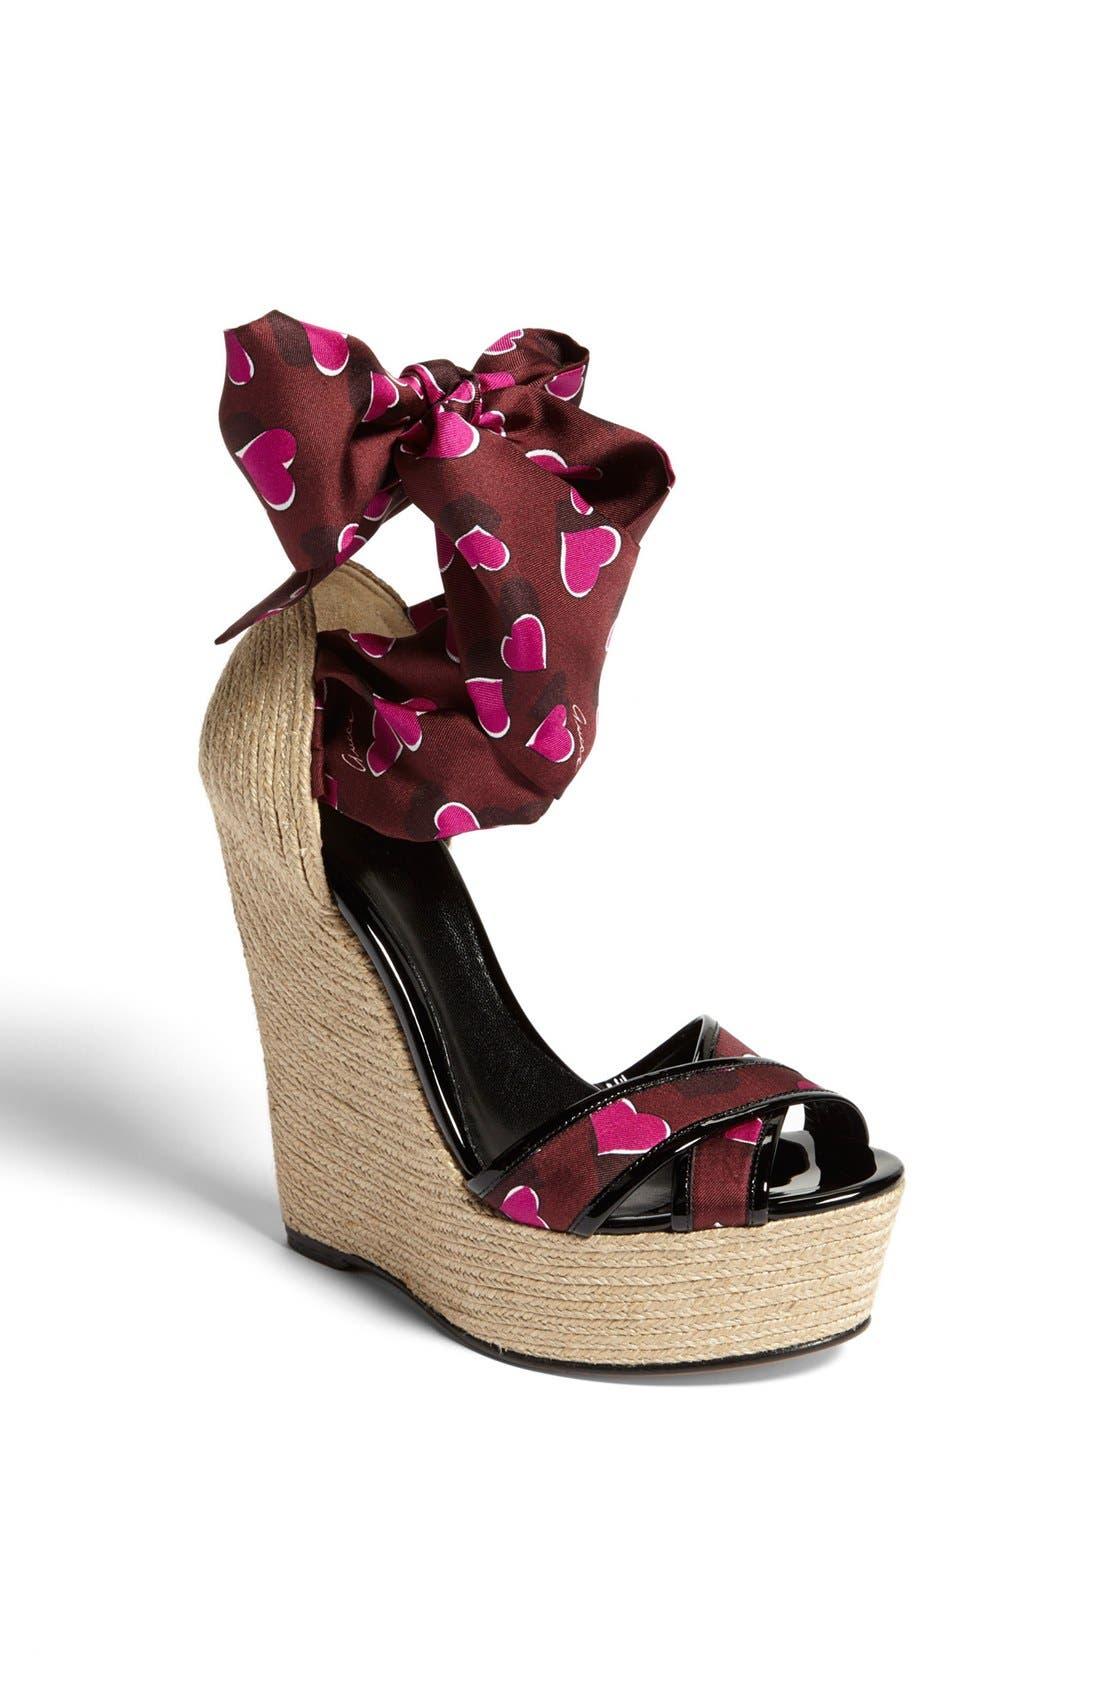 Alternate Image 1 Selected - Gucci 'Carolina' Print Espadrille Wedge Sandal